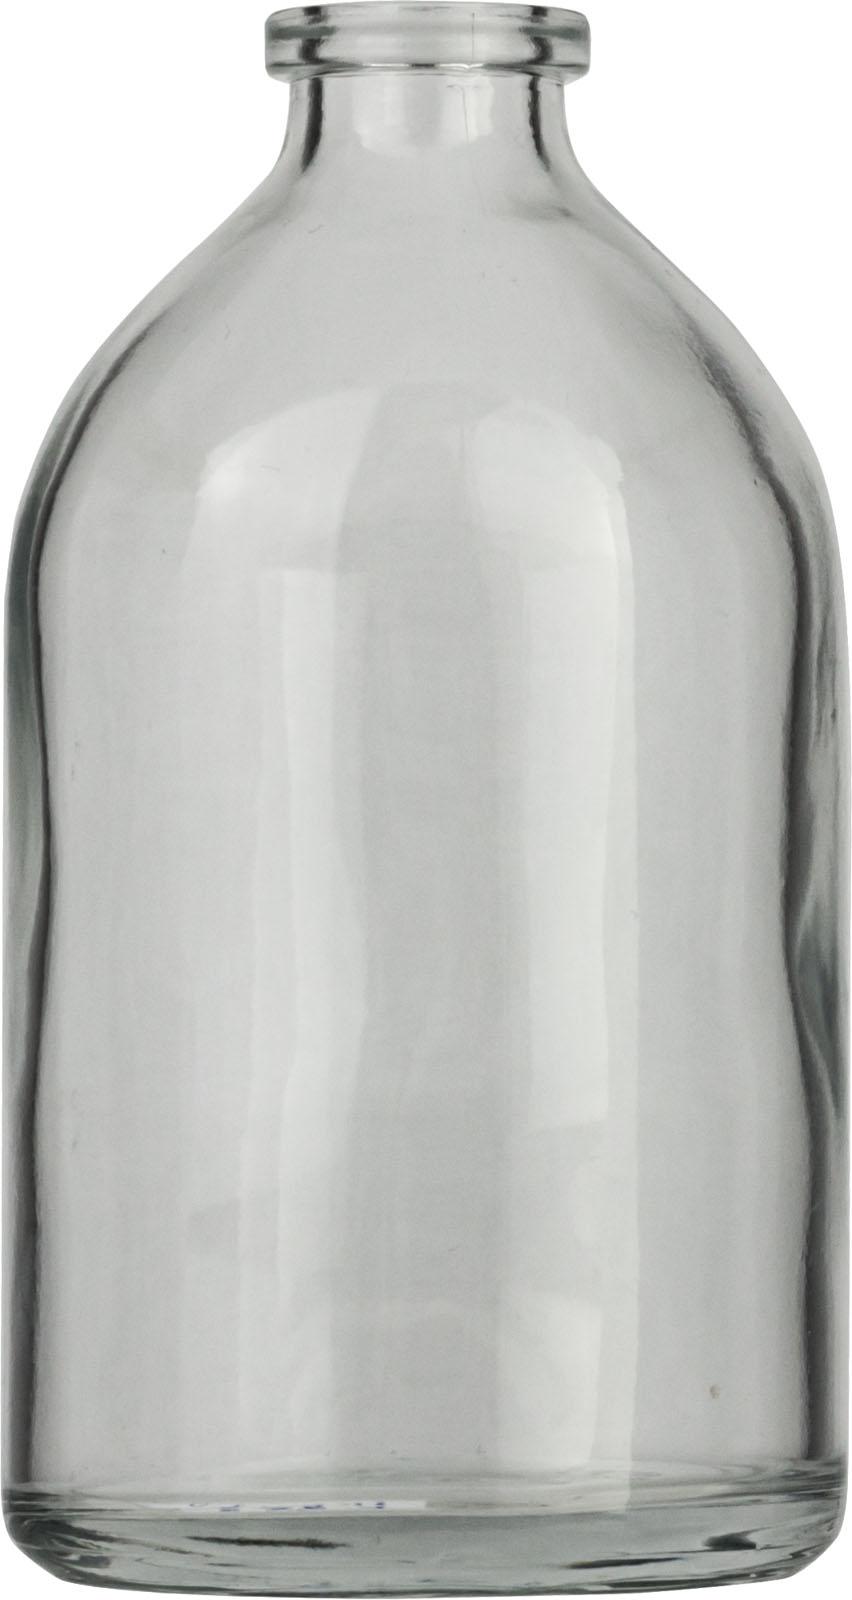 Vial N20-100, RR, k, 51,6x94,5, fl., DIN